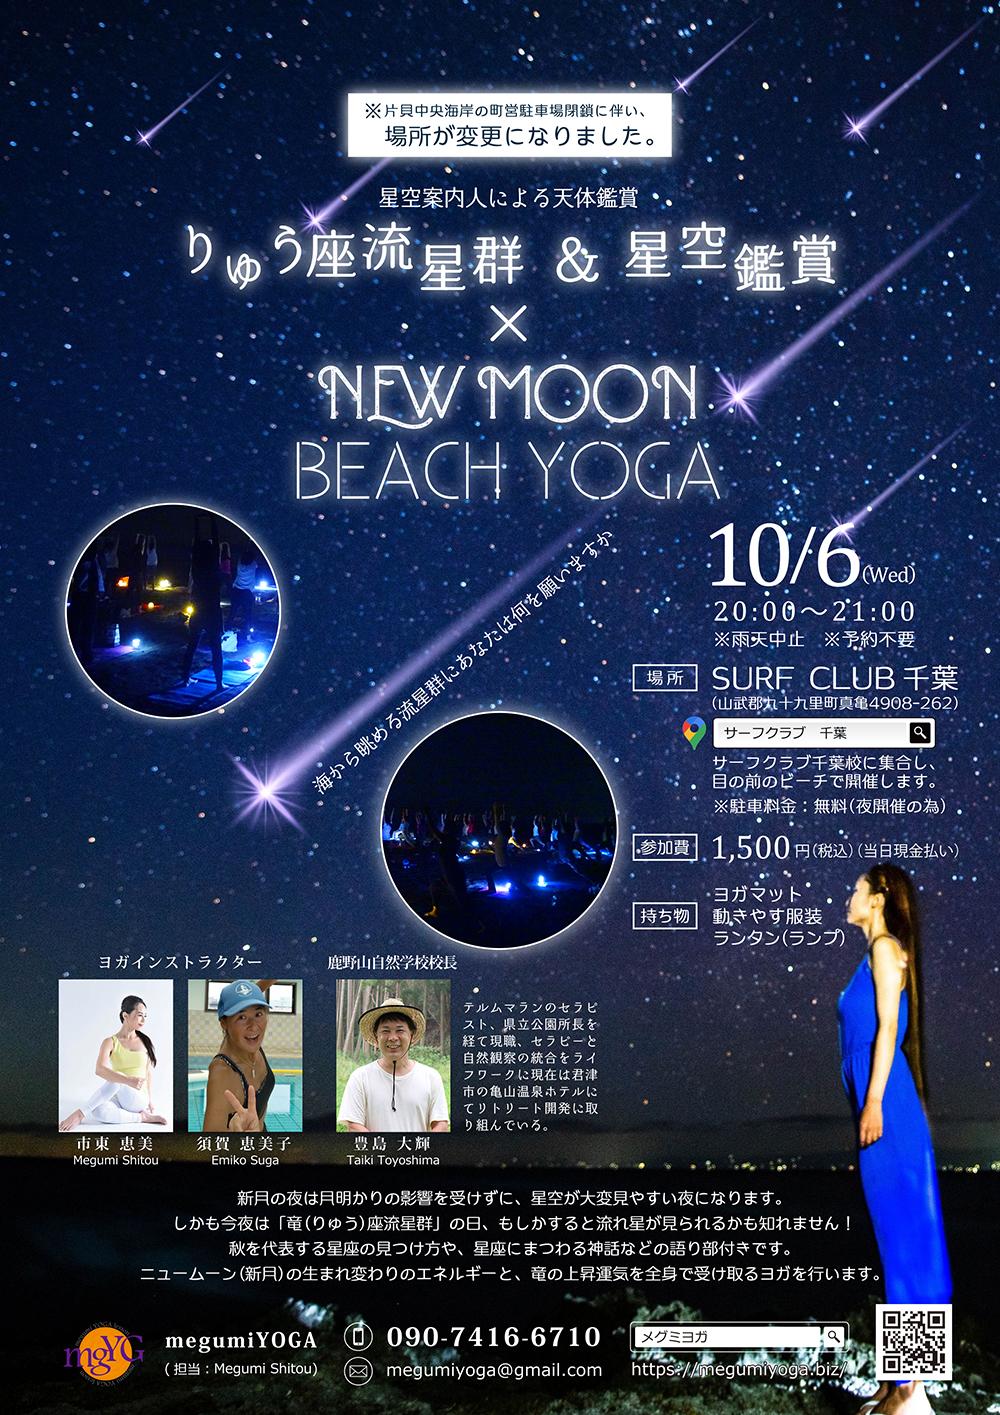 星空鑑賞 × NEW MOON BEACH YOGA